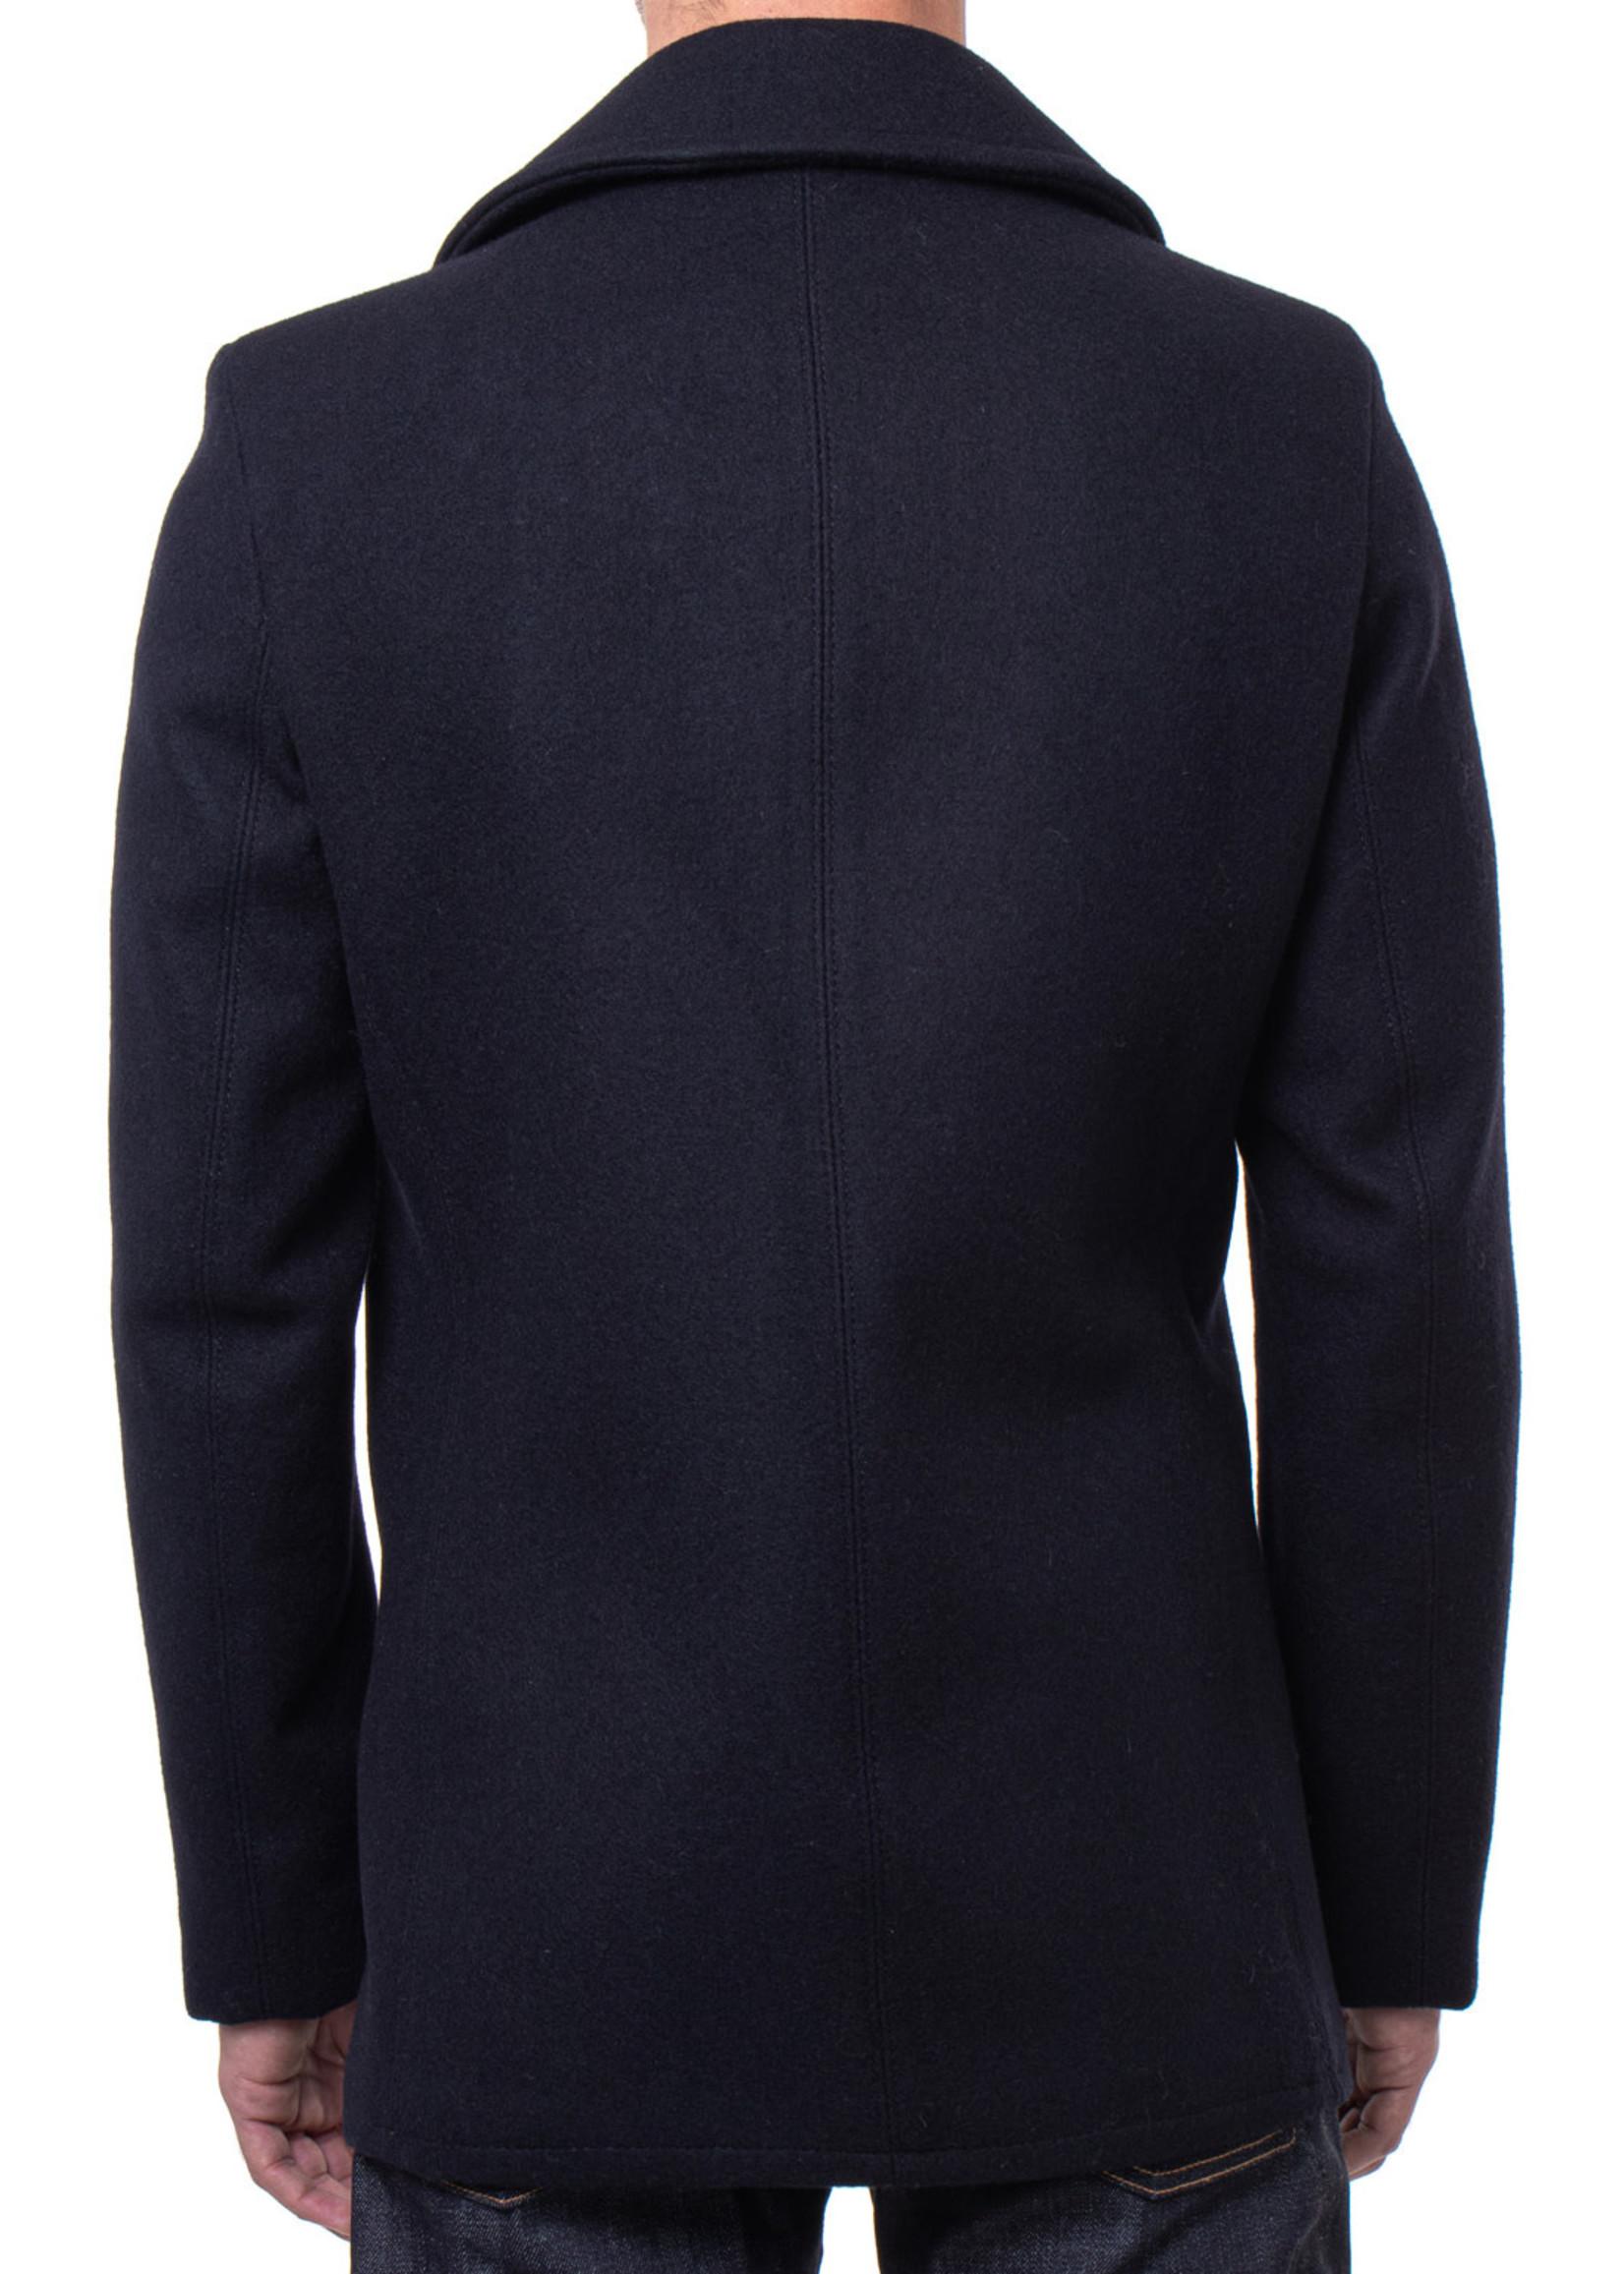 Schott Navy Melton Wool Peacoat